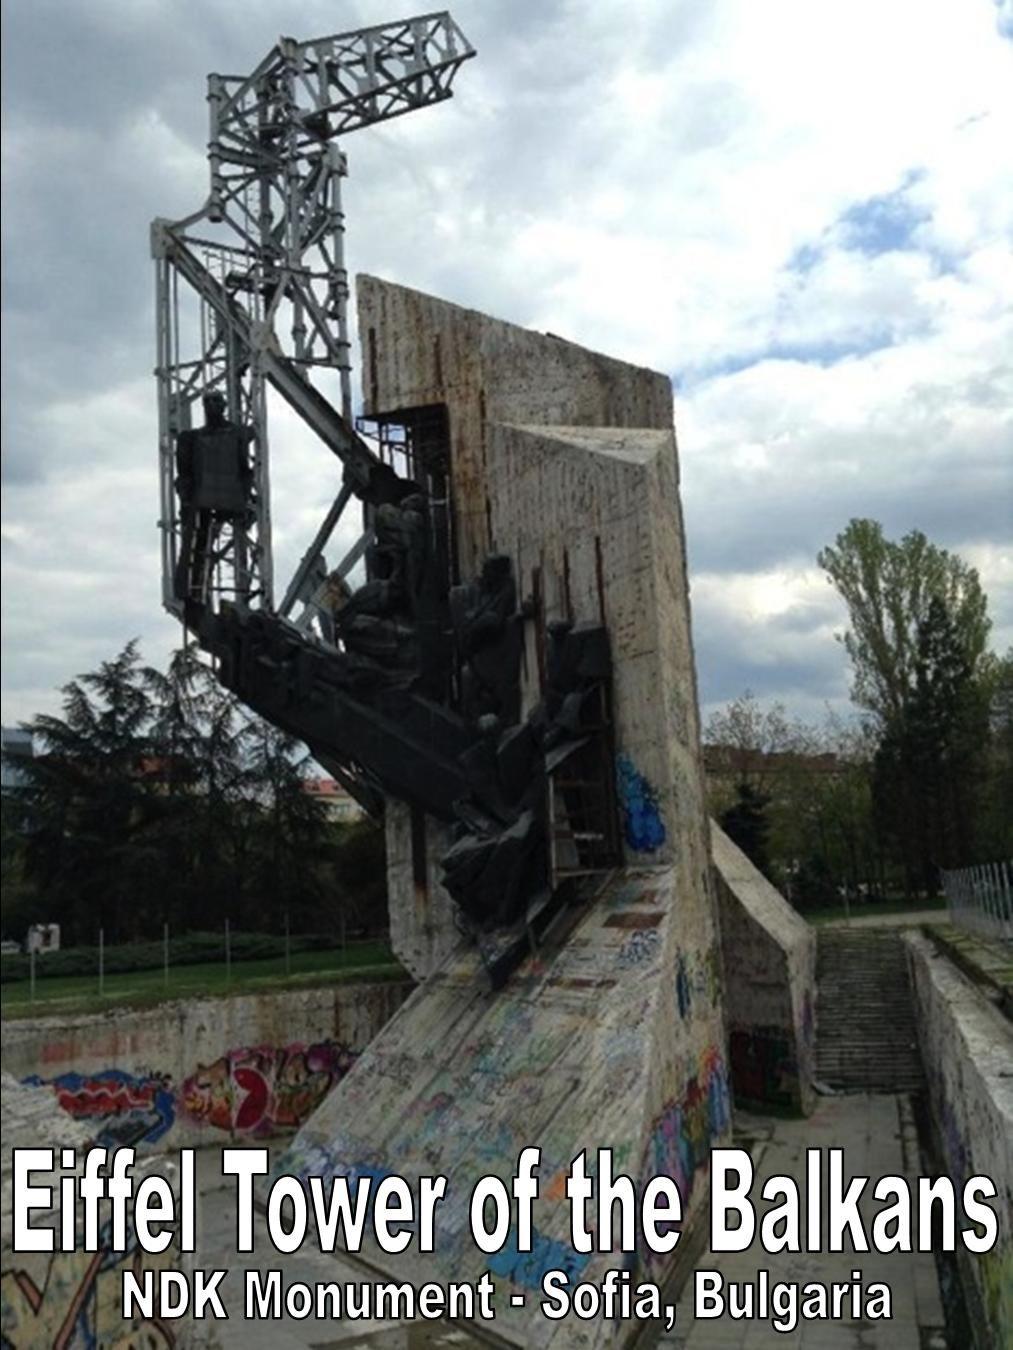 Eiffel Tower of the Balkans - NDK Monument - Sofia, Bulgaria | What